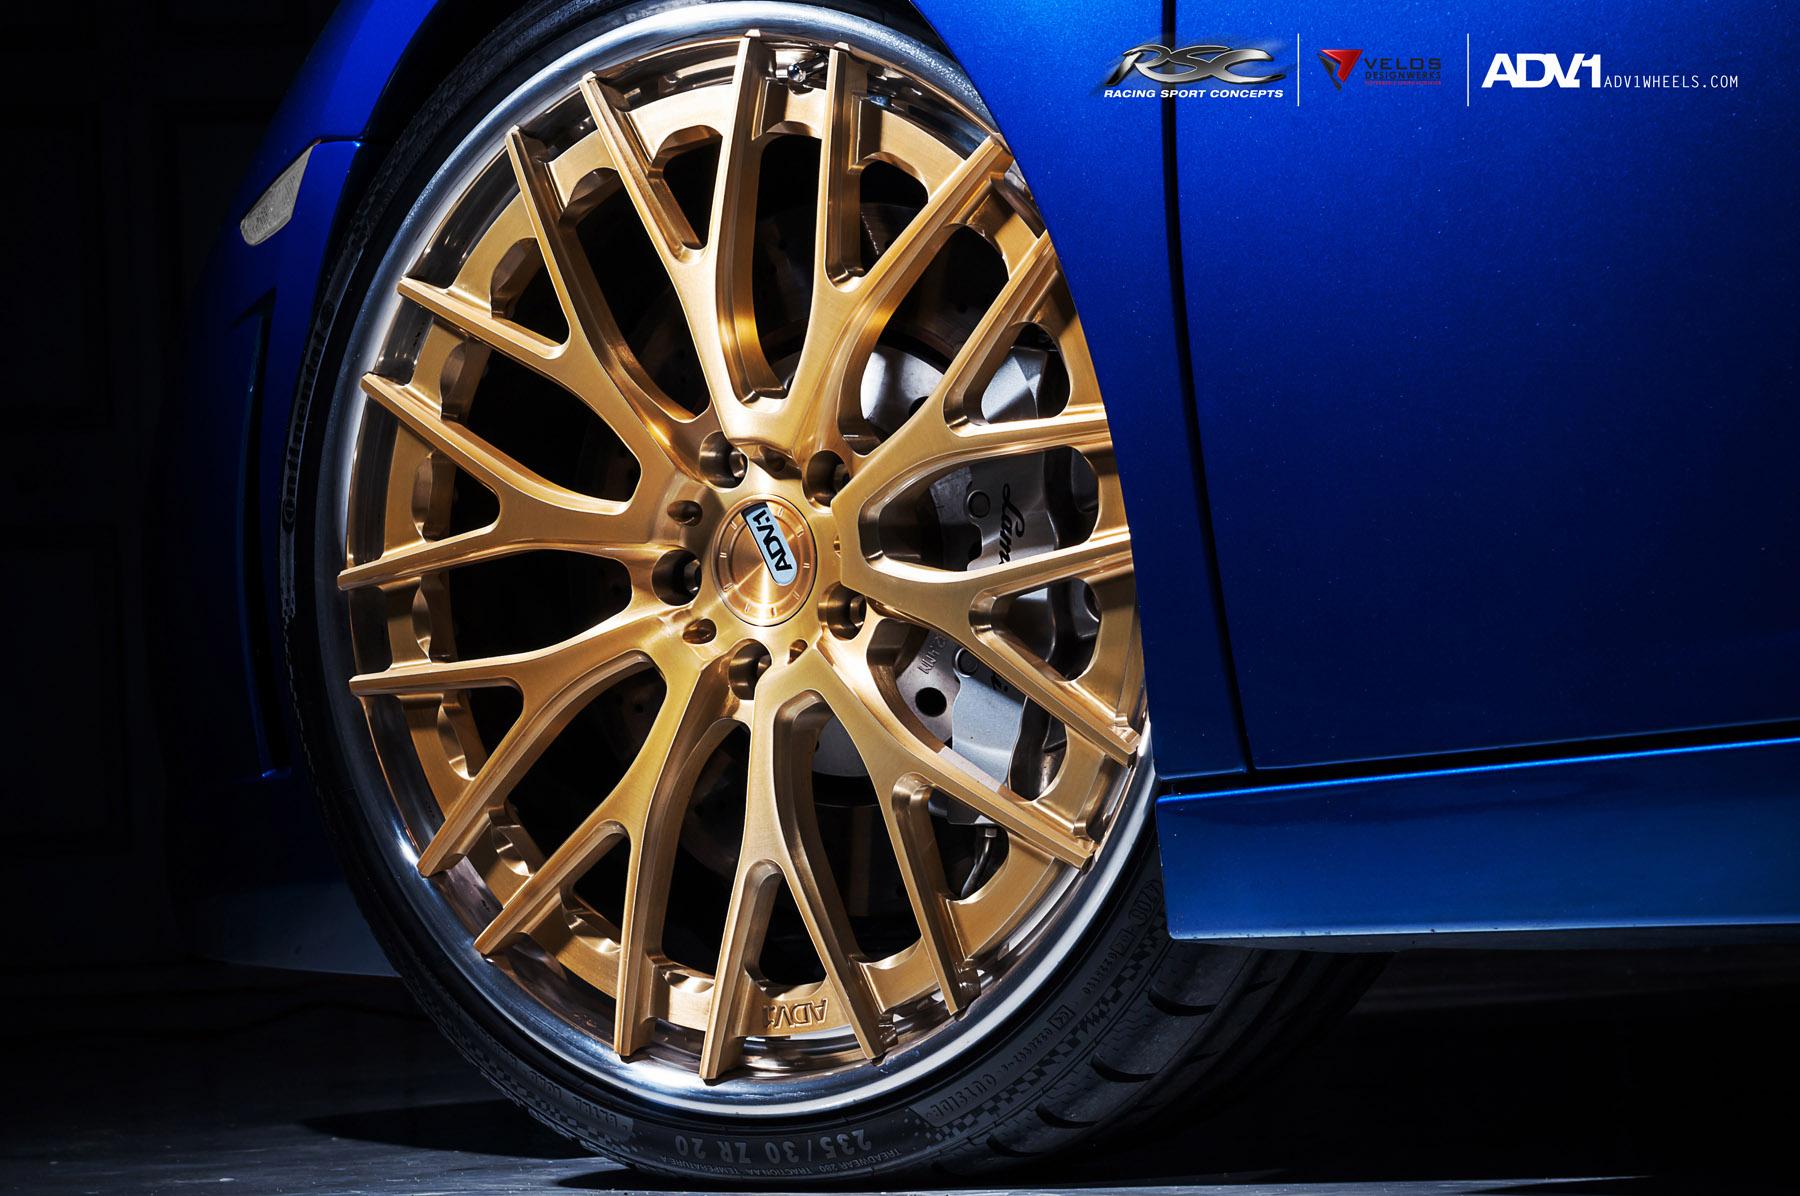 ADV.1 колеса Lamborghini Gallardo ADV10.0TS SL Gold Edition  - фотография №11